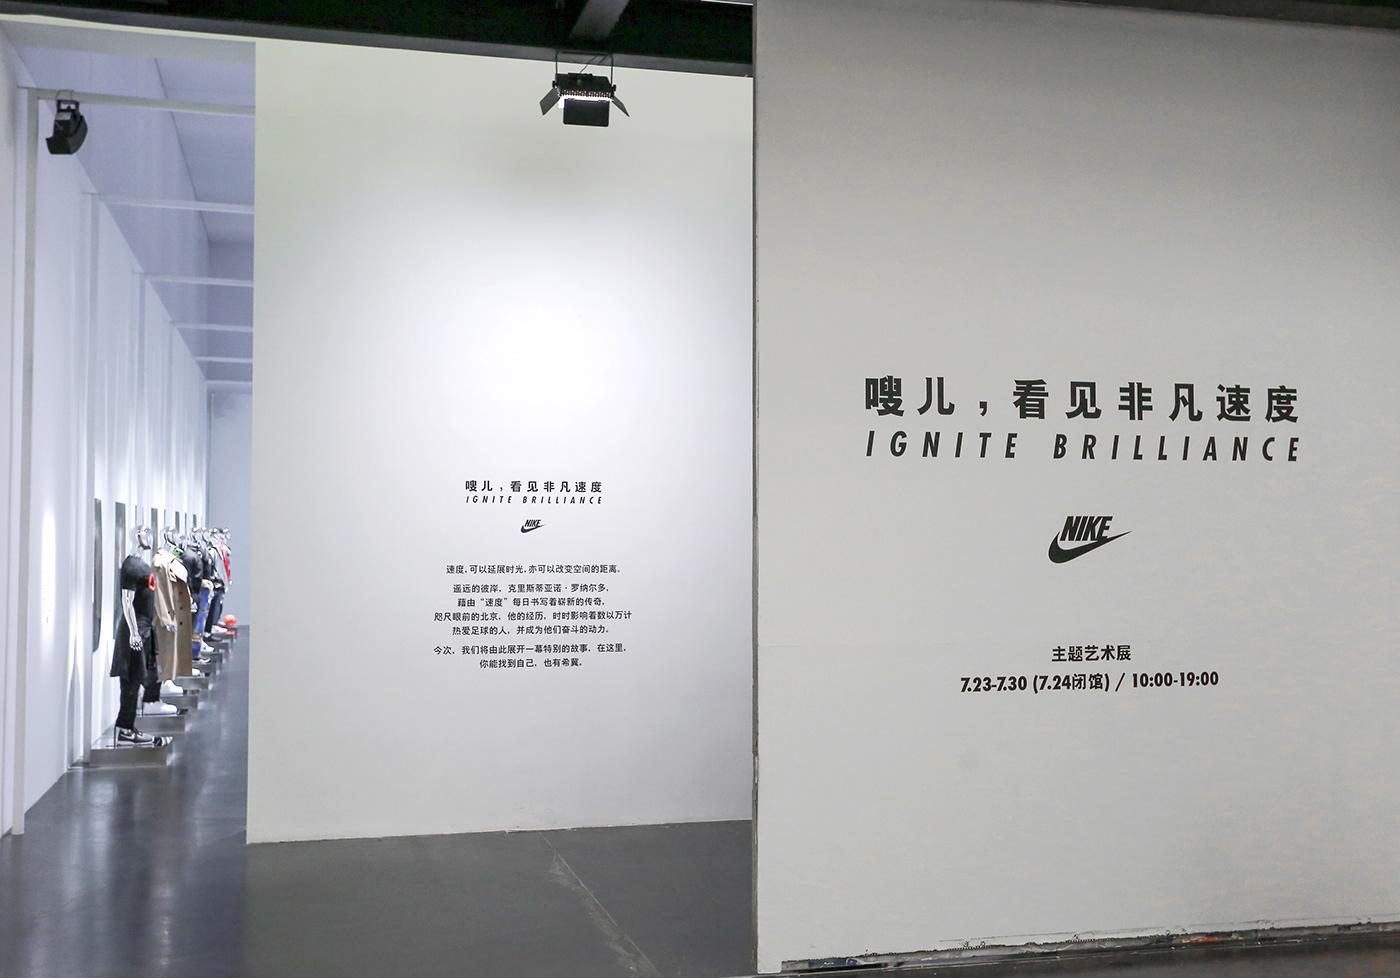 NIKE Ignite Brilliance exhibition on Behance